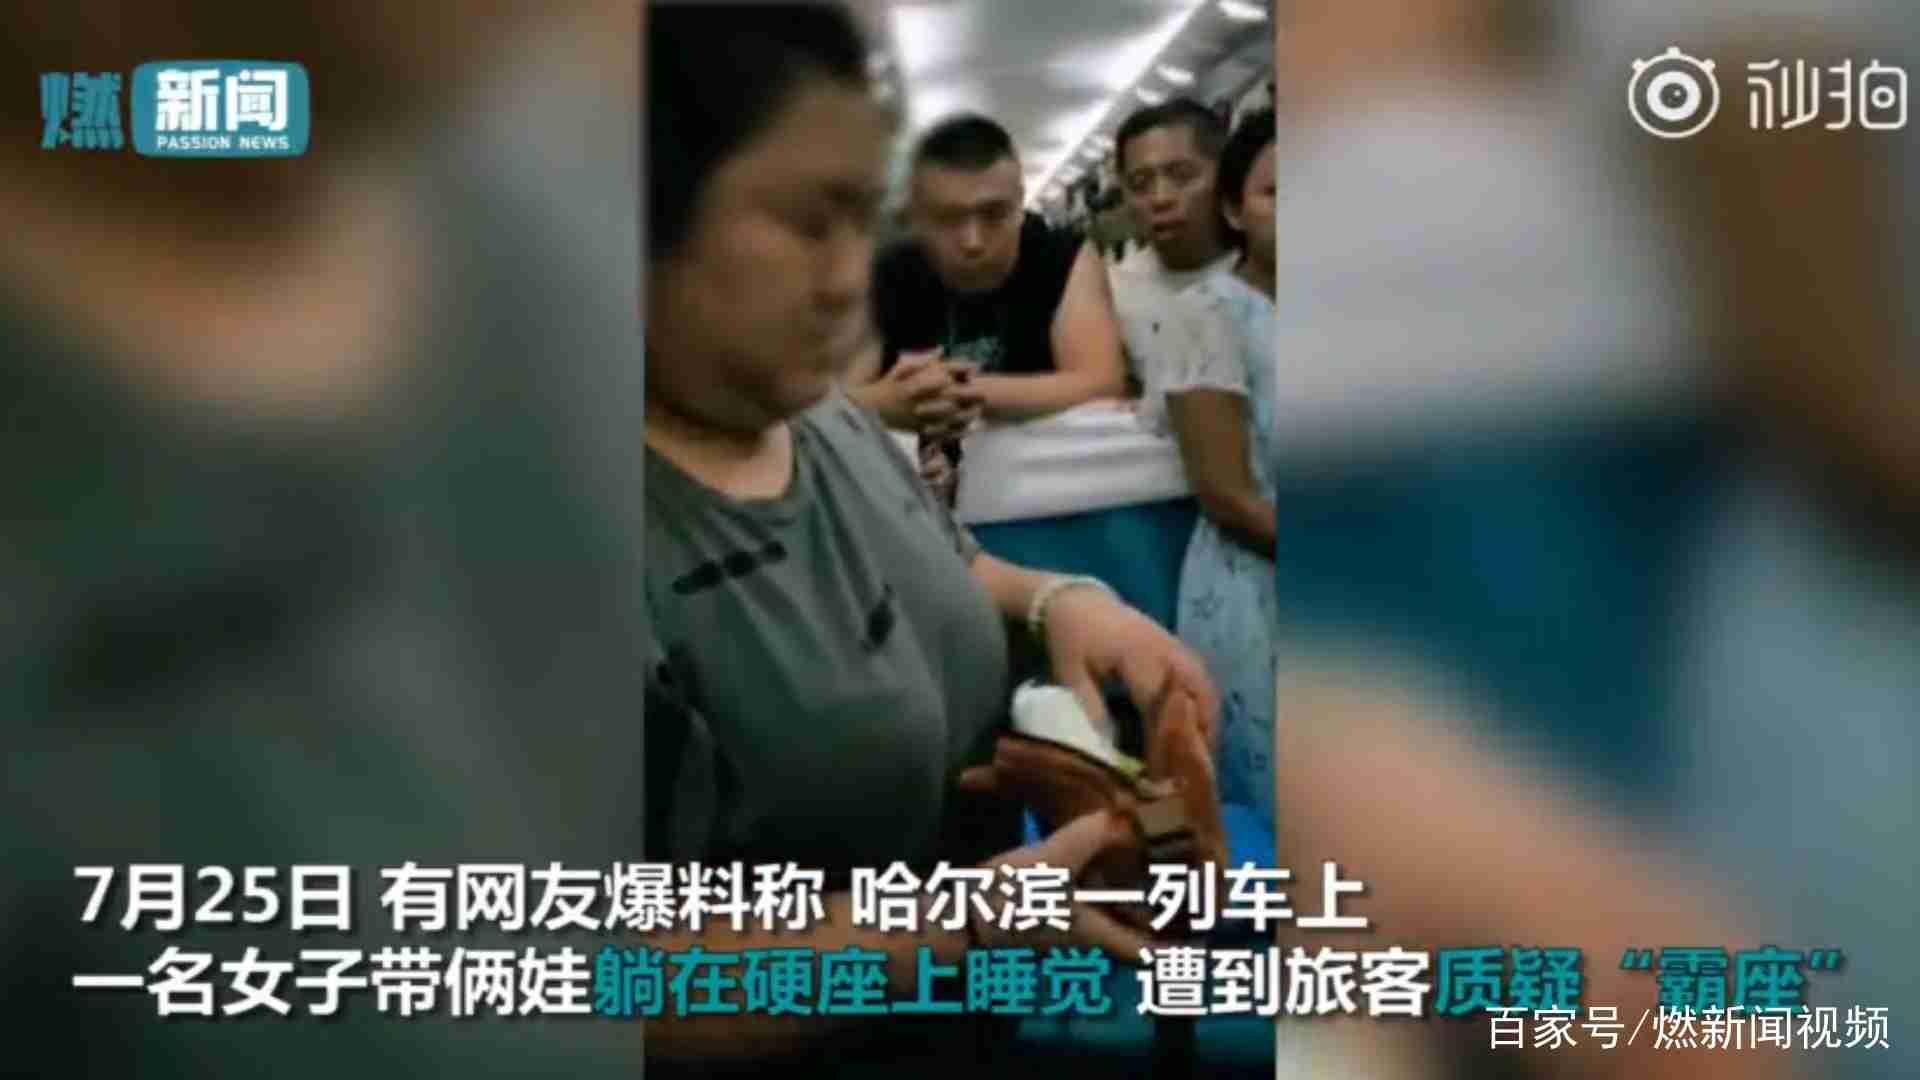 "<b>女乘客一人占6座给娃睡觉 乘客质疑""霸座"" 她甩手亮出6张车票</b>"